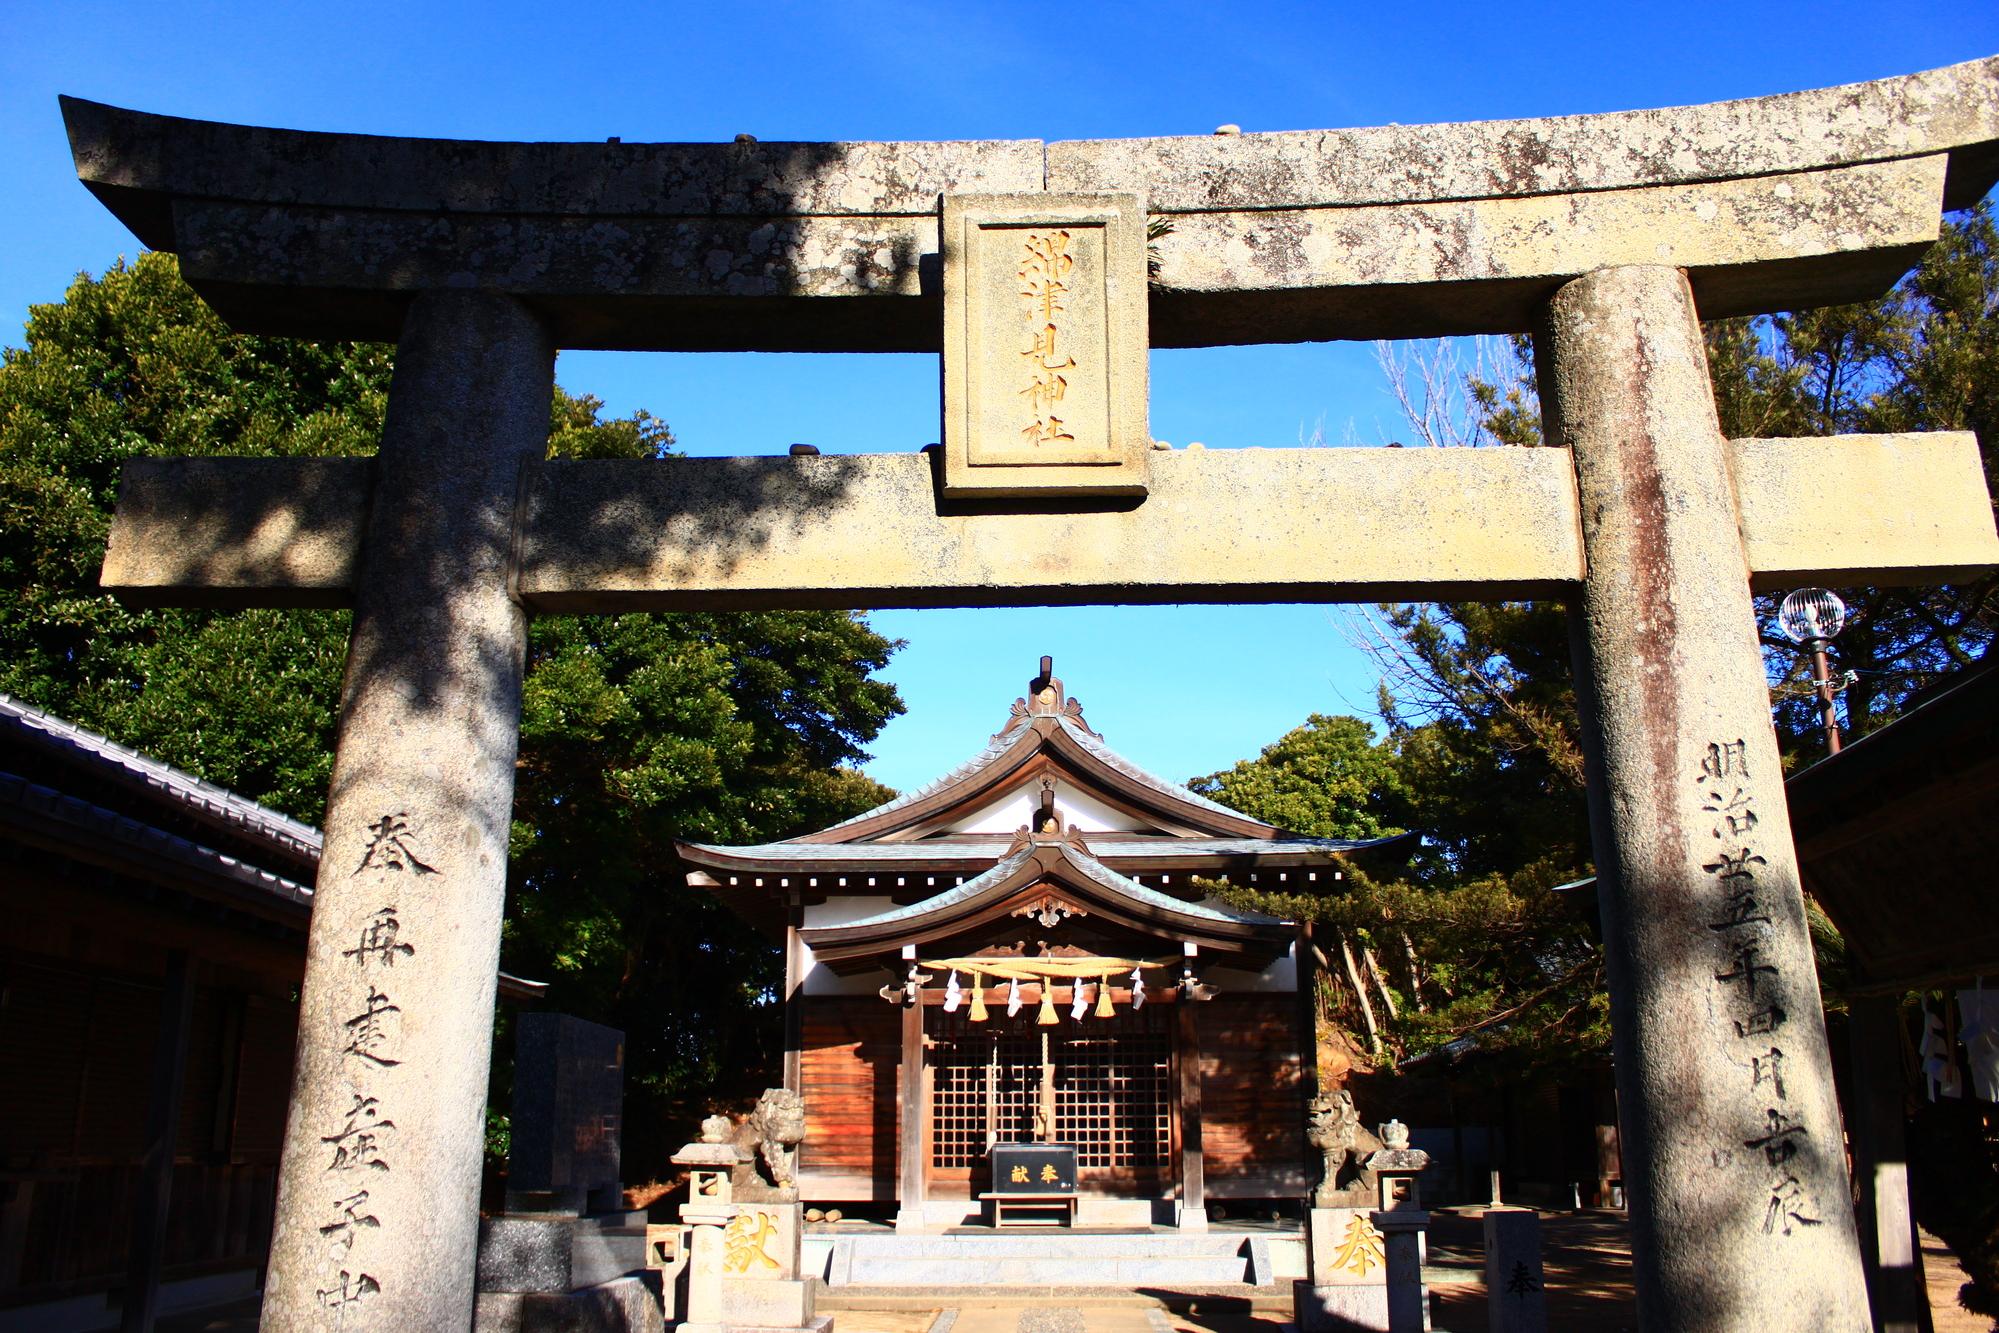 Watazumi-jinja Shrine, where a legend of Ryugu has been told since old times.